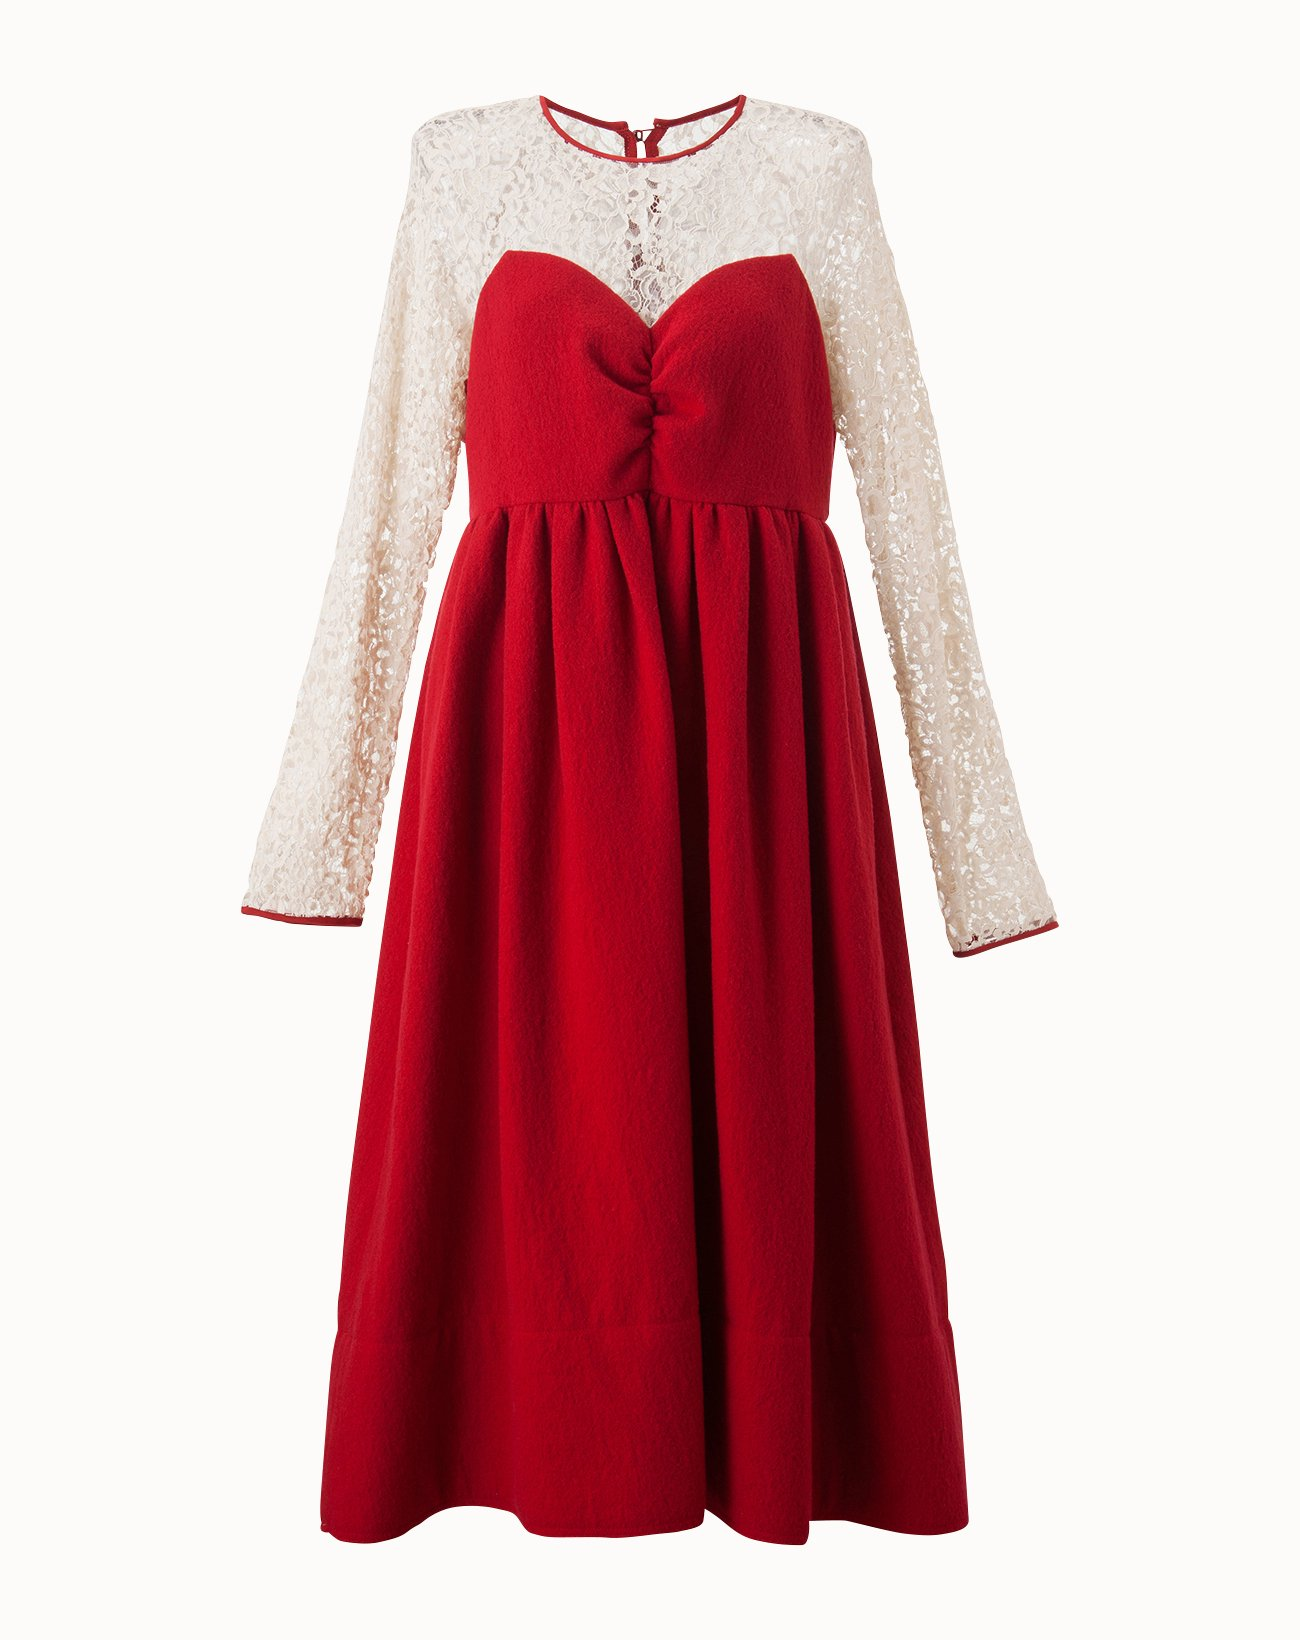 Wool Soft Melton Dress - Red